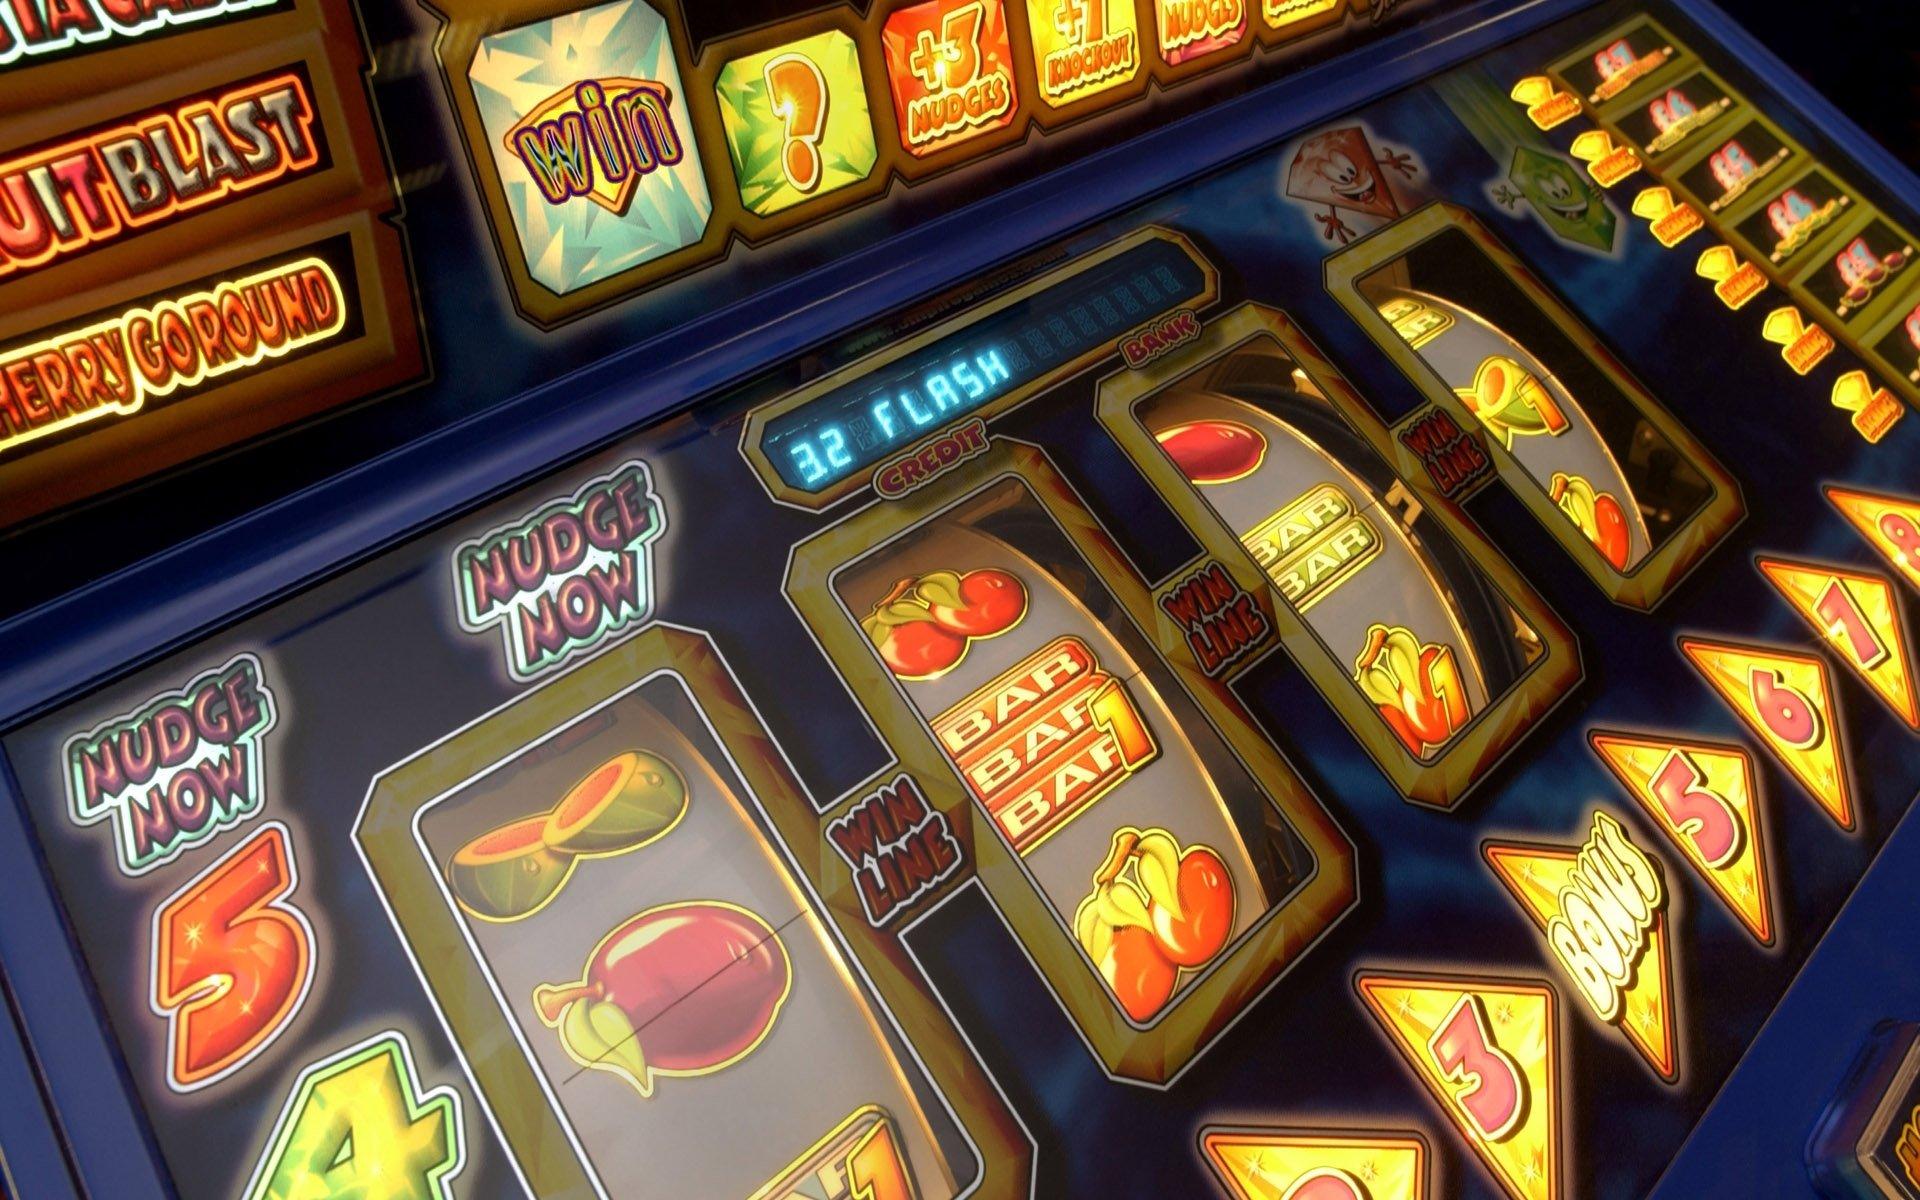 Gambling And Money Issues & Compulsive Behavior